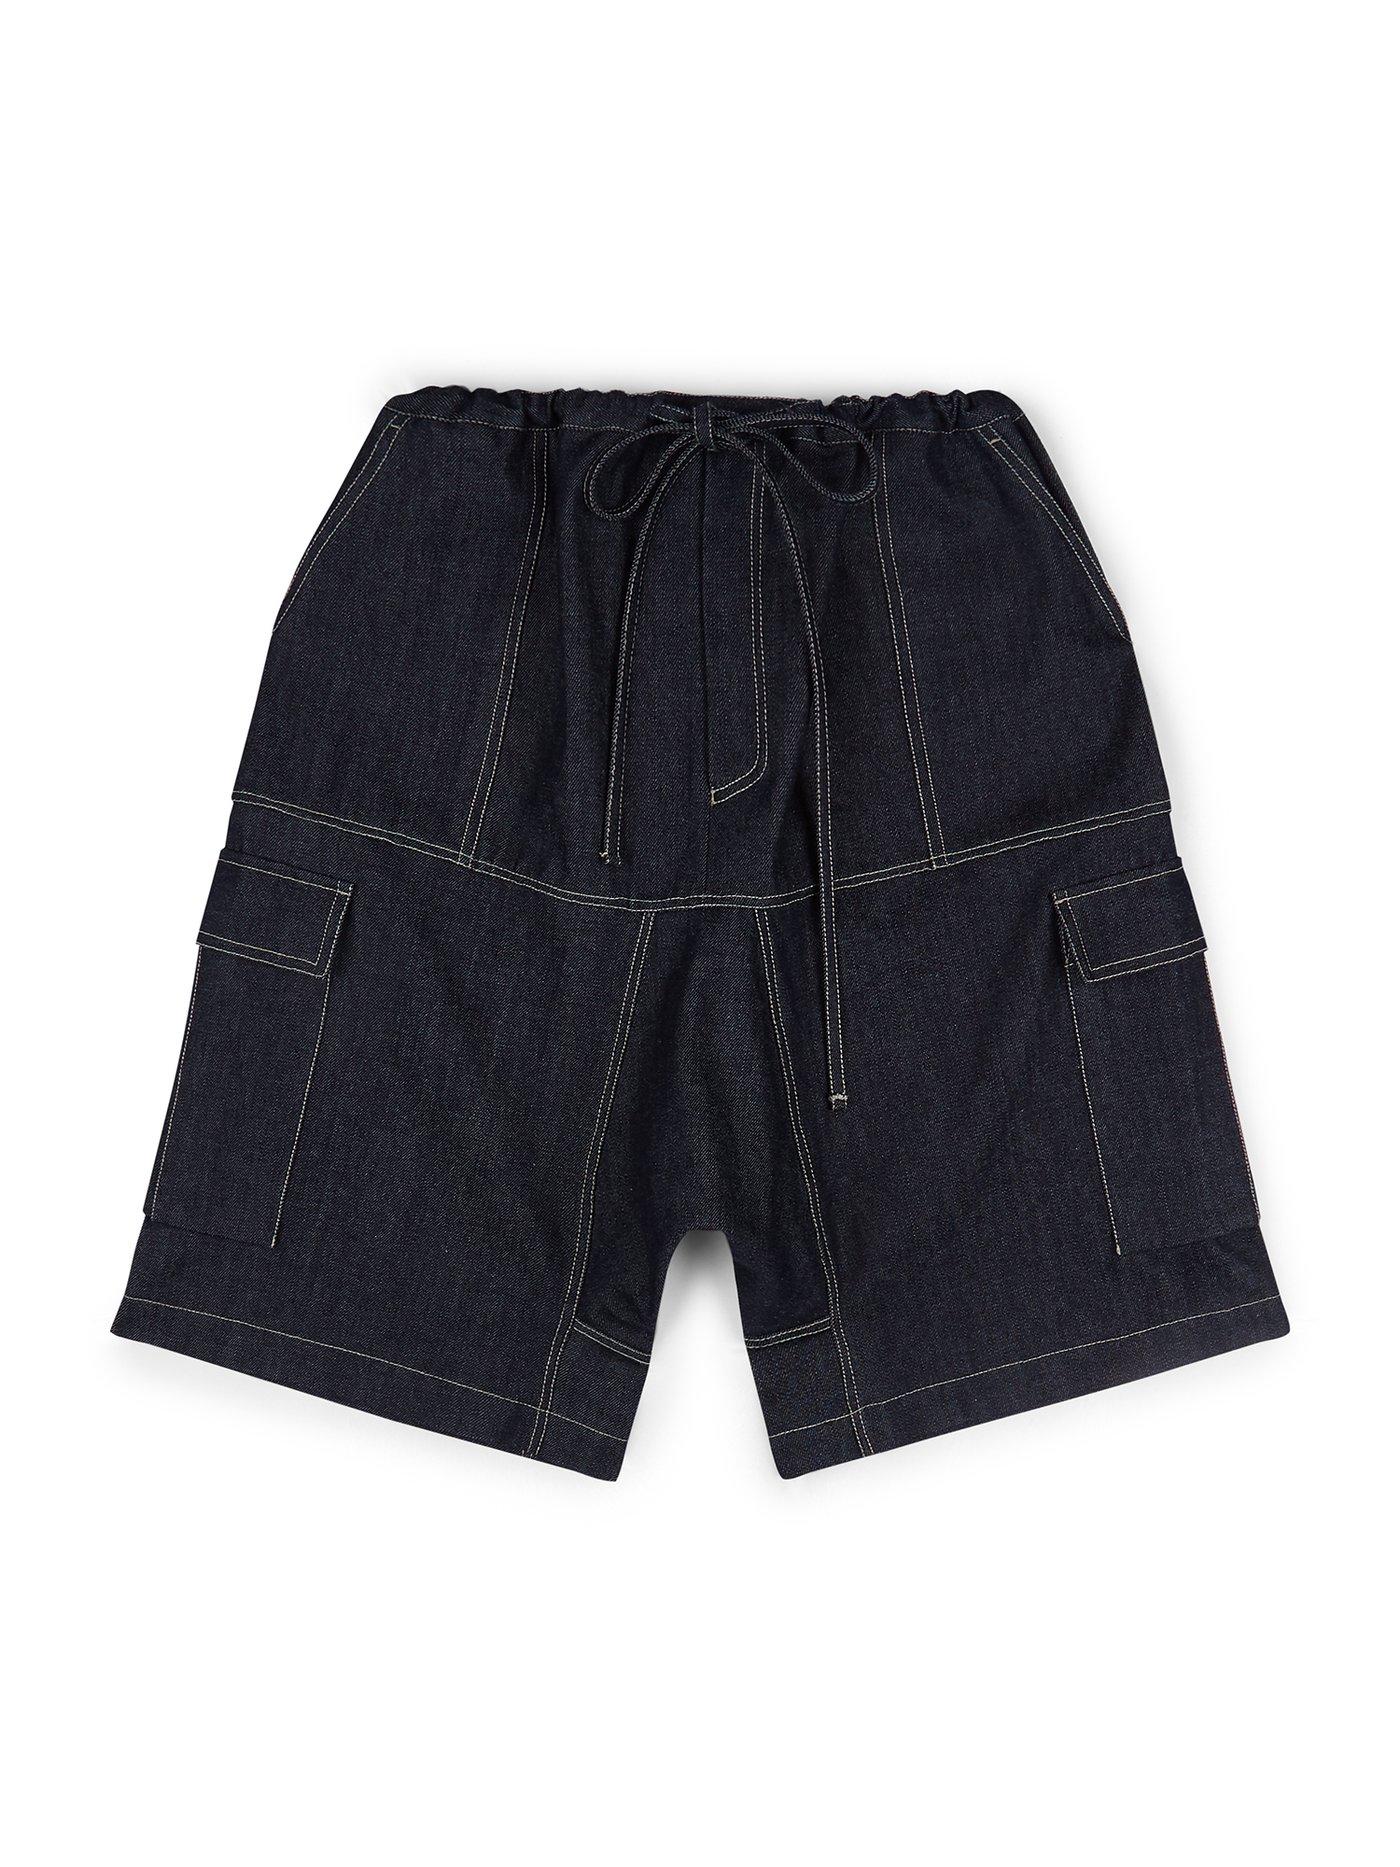 E Tautz Rupert shorts - £215 - A superb update of school boy shorts, cut from dark indigo denim and oversized for a modern and wearable look